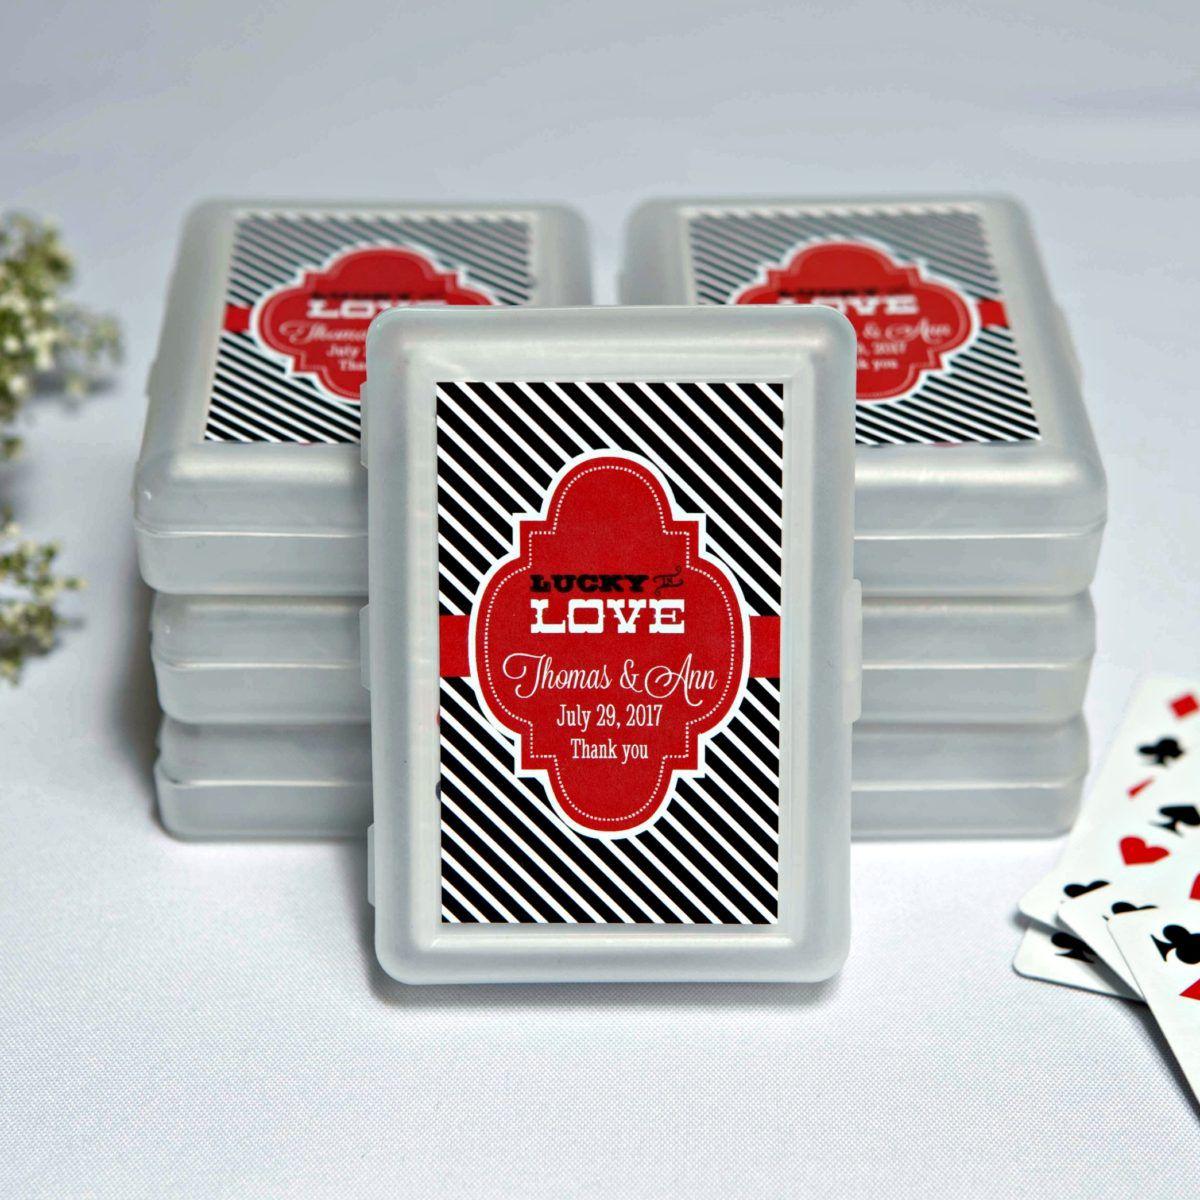 Las Vegas Themed Playing Cards | Las Vegas Wedding Favors Ideas ...